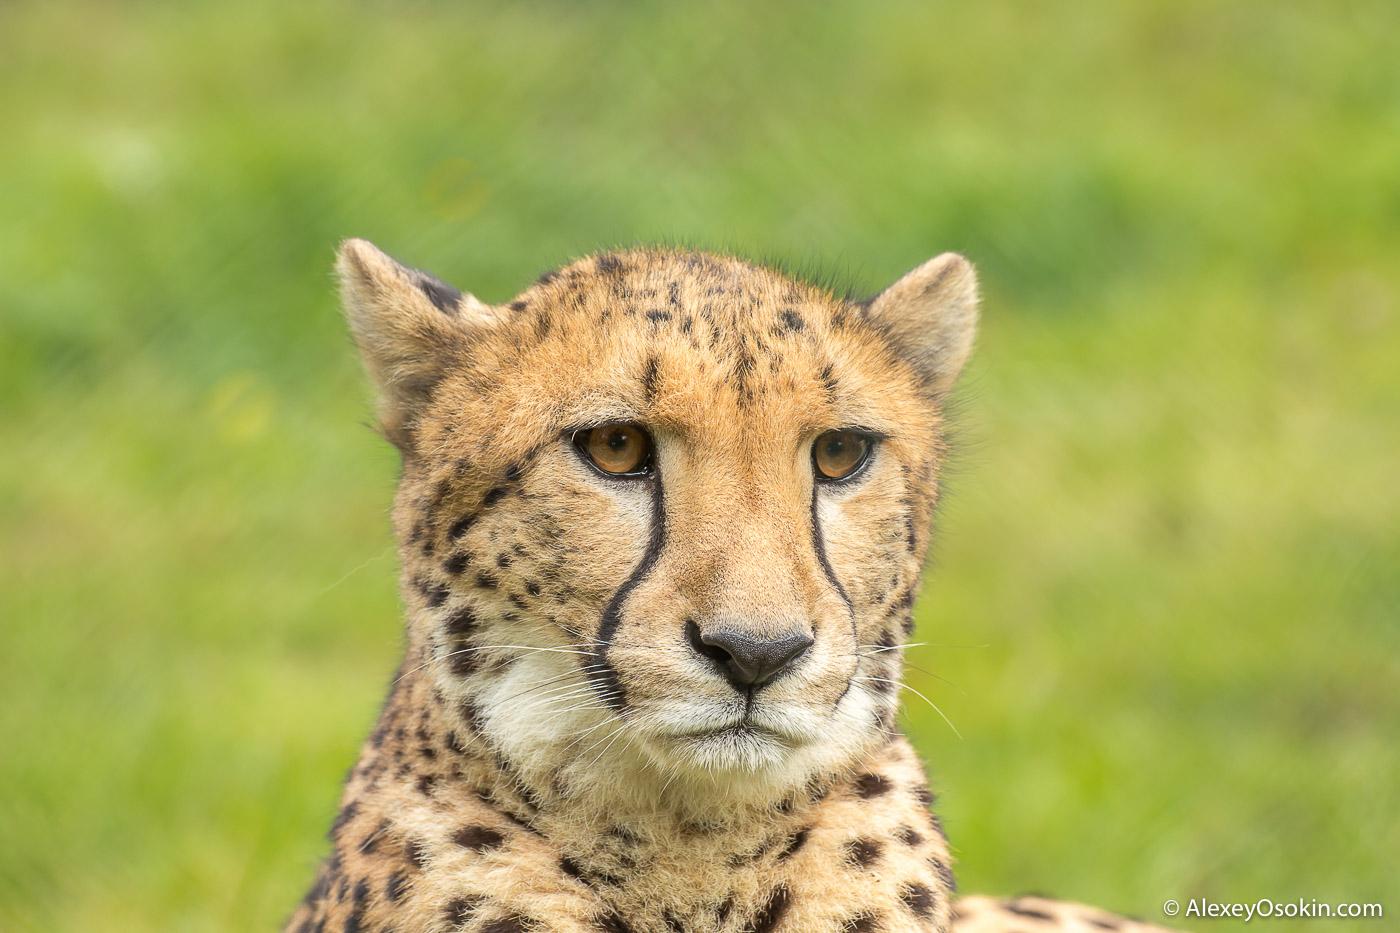 Cheetah_prague_zoo-ao-6.jpg